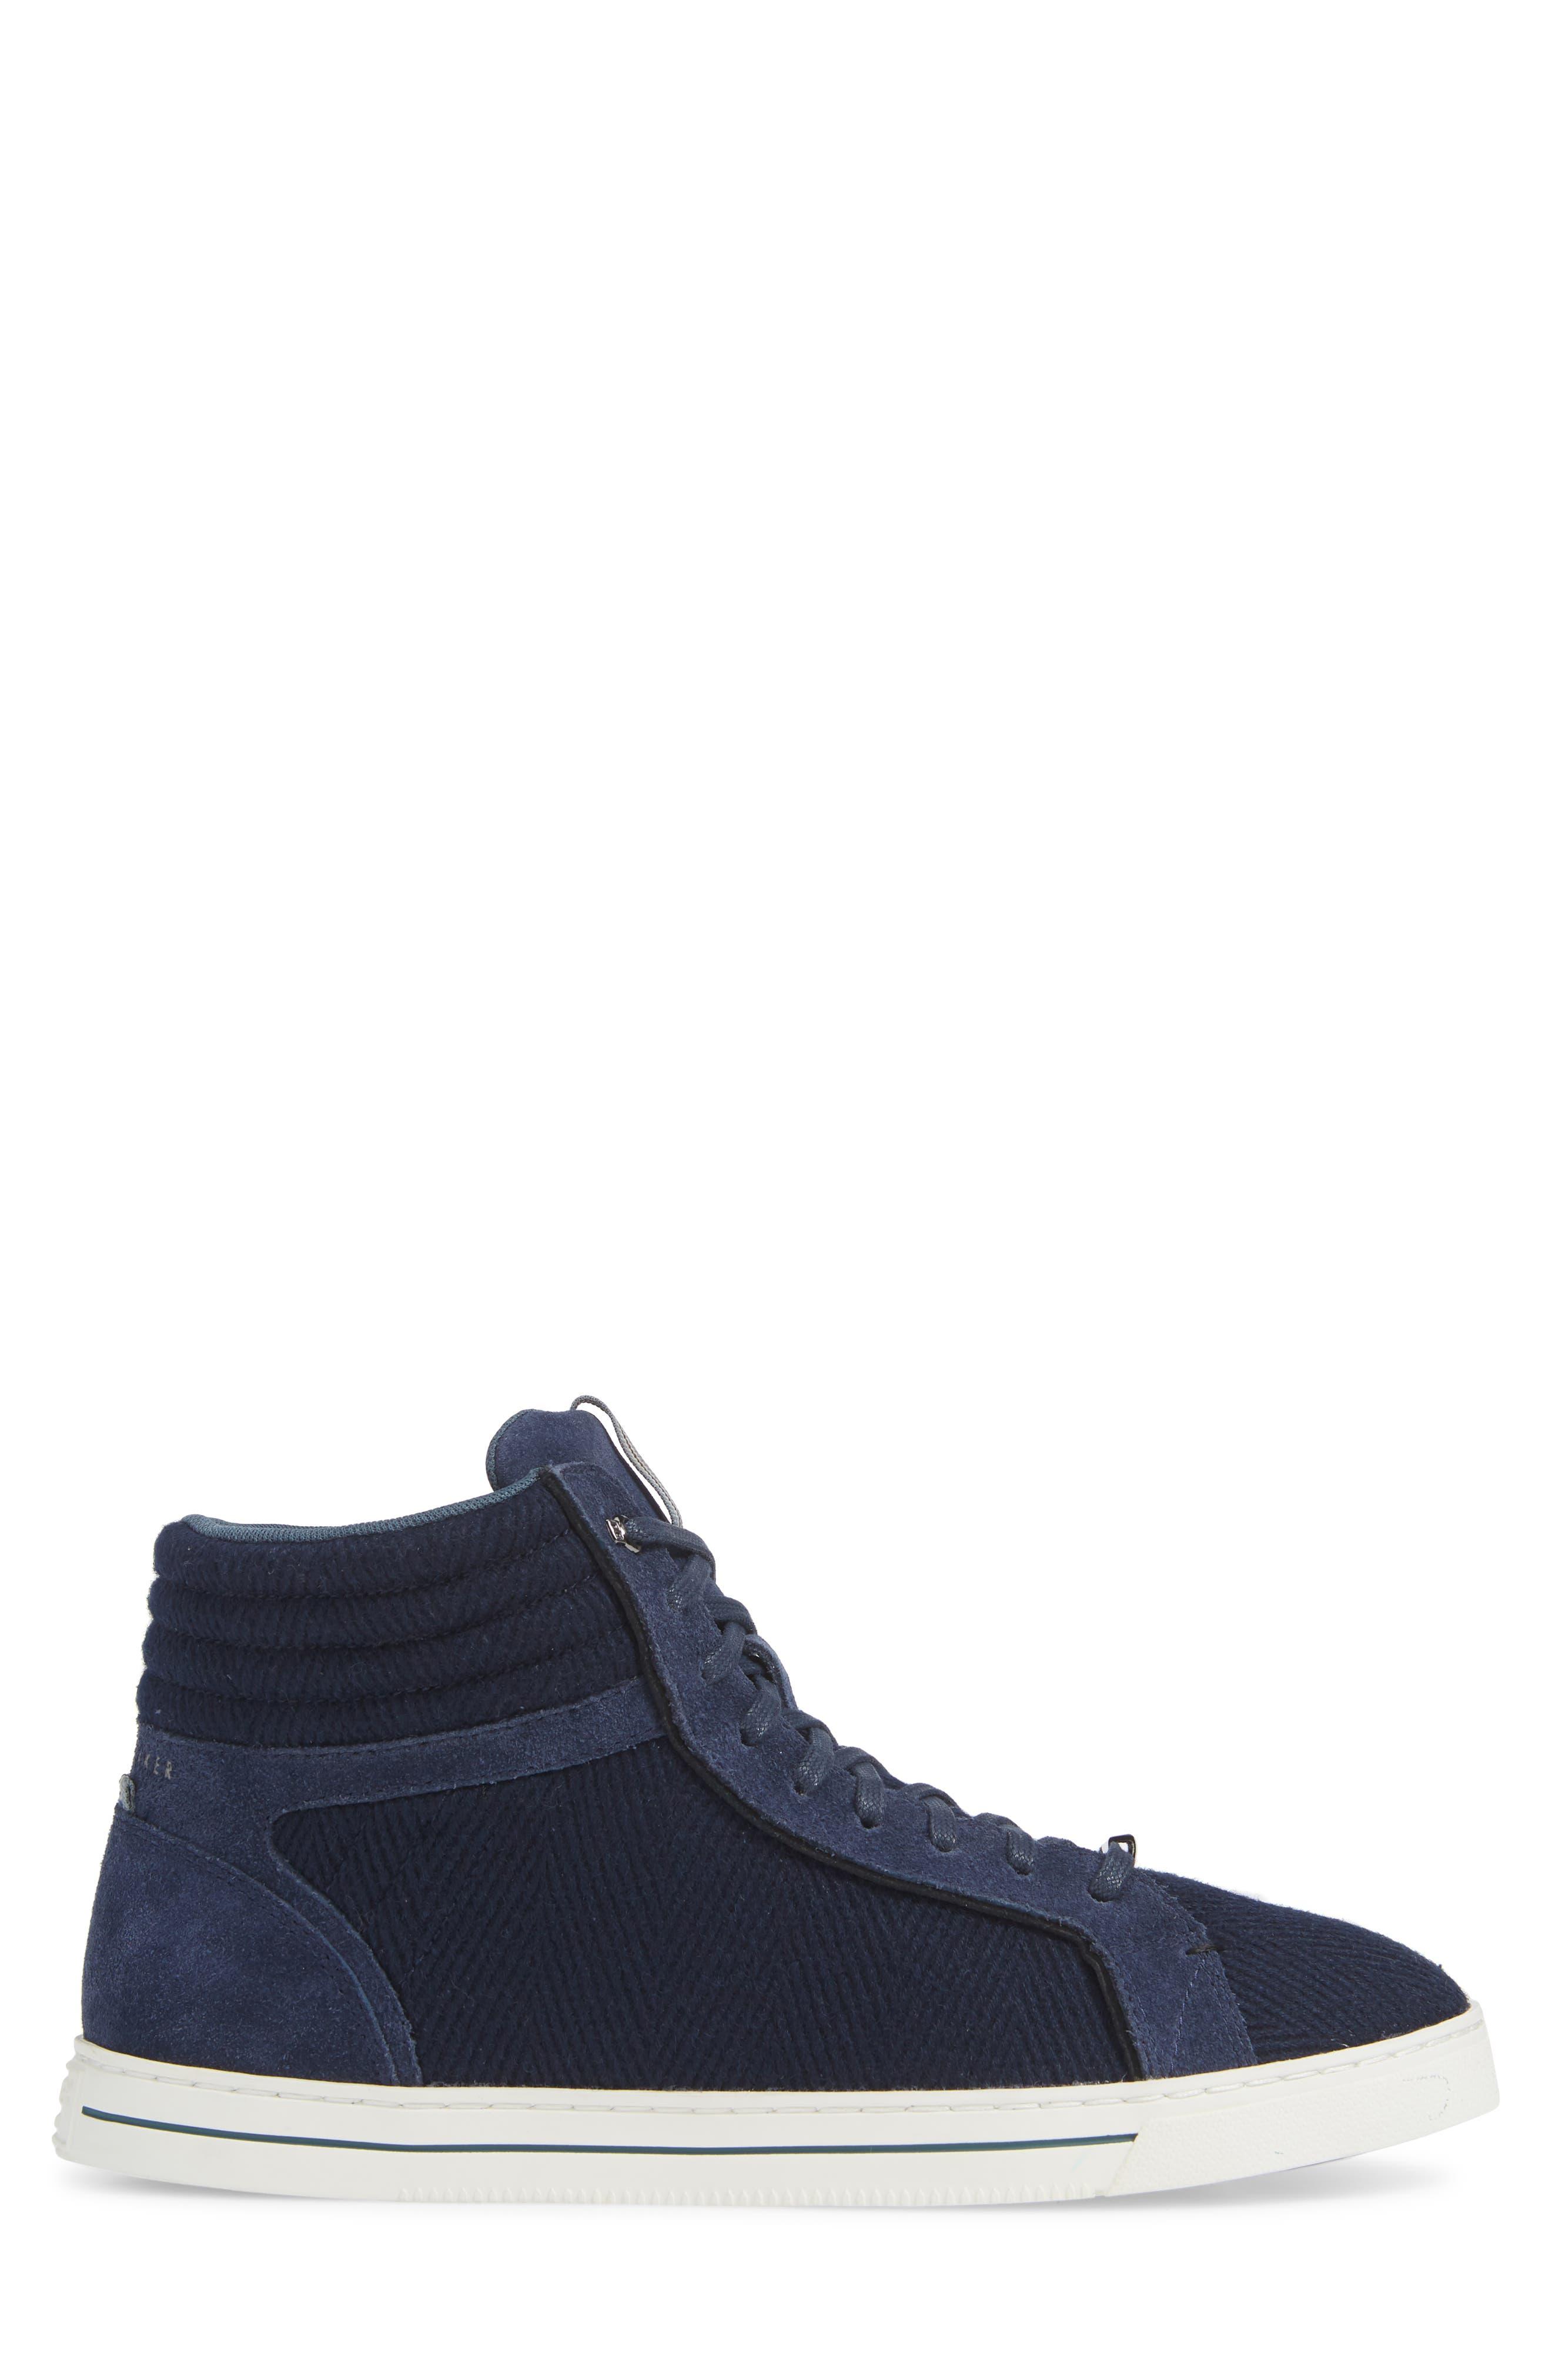 Luckan High Top Sneaker,                             Alternate thumbnail 3, color,                             DARK BLUE FABRIC